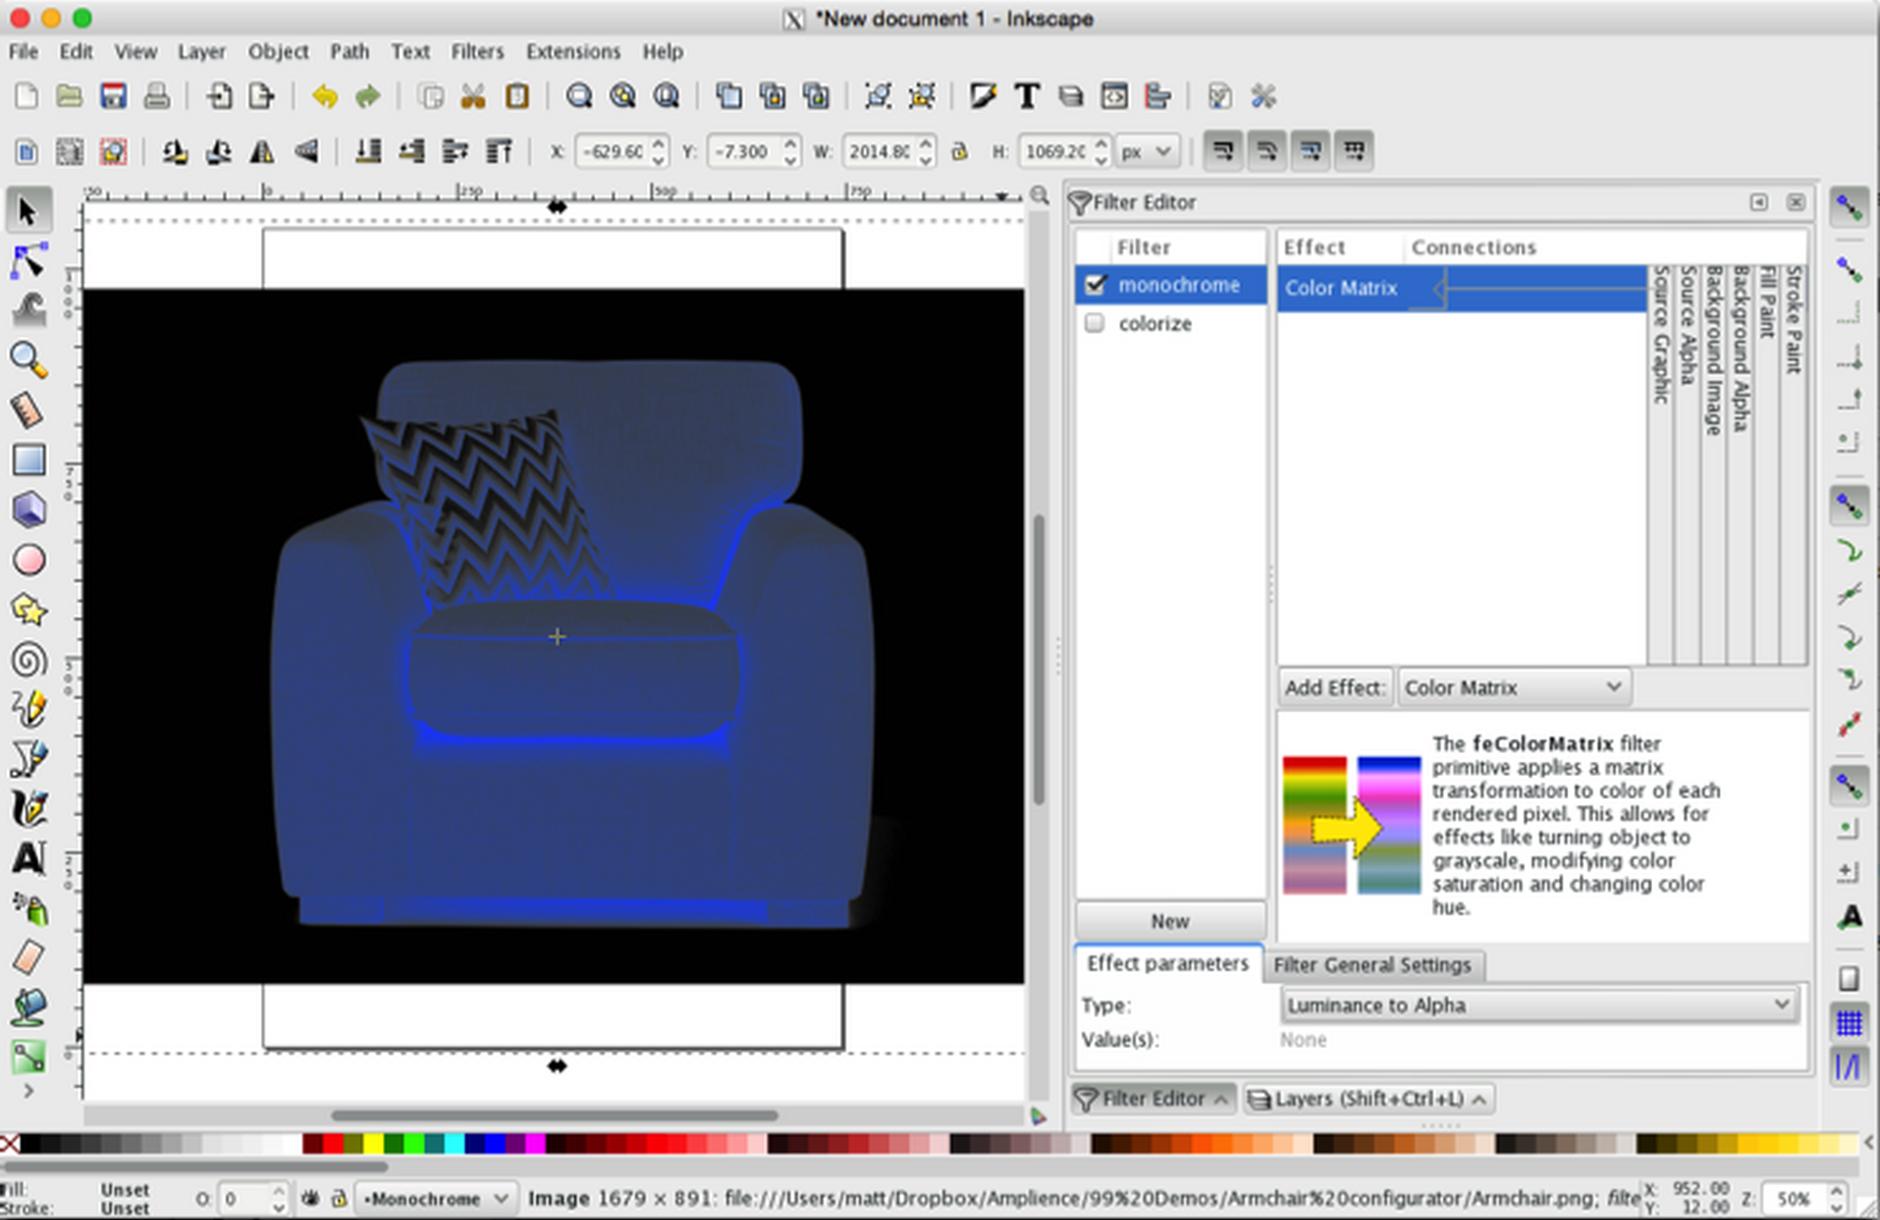 Adding the color matrix effect